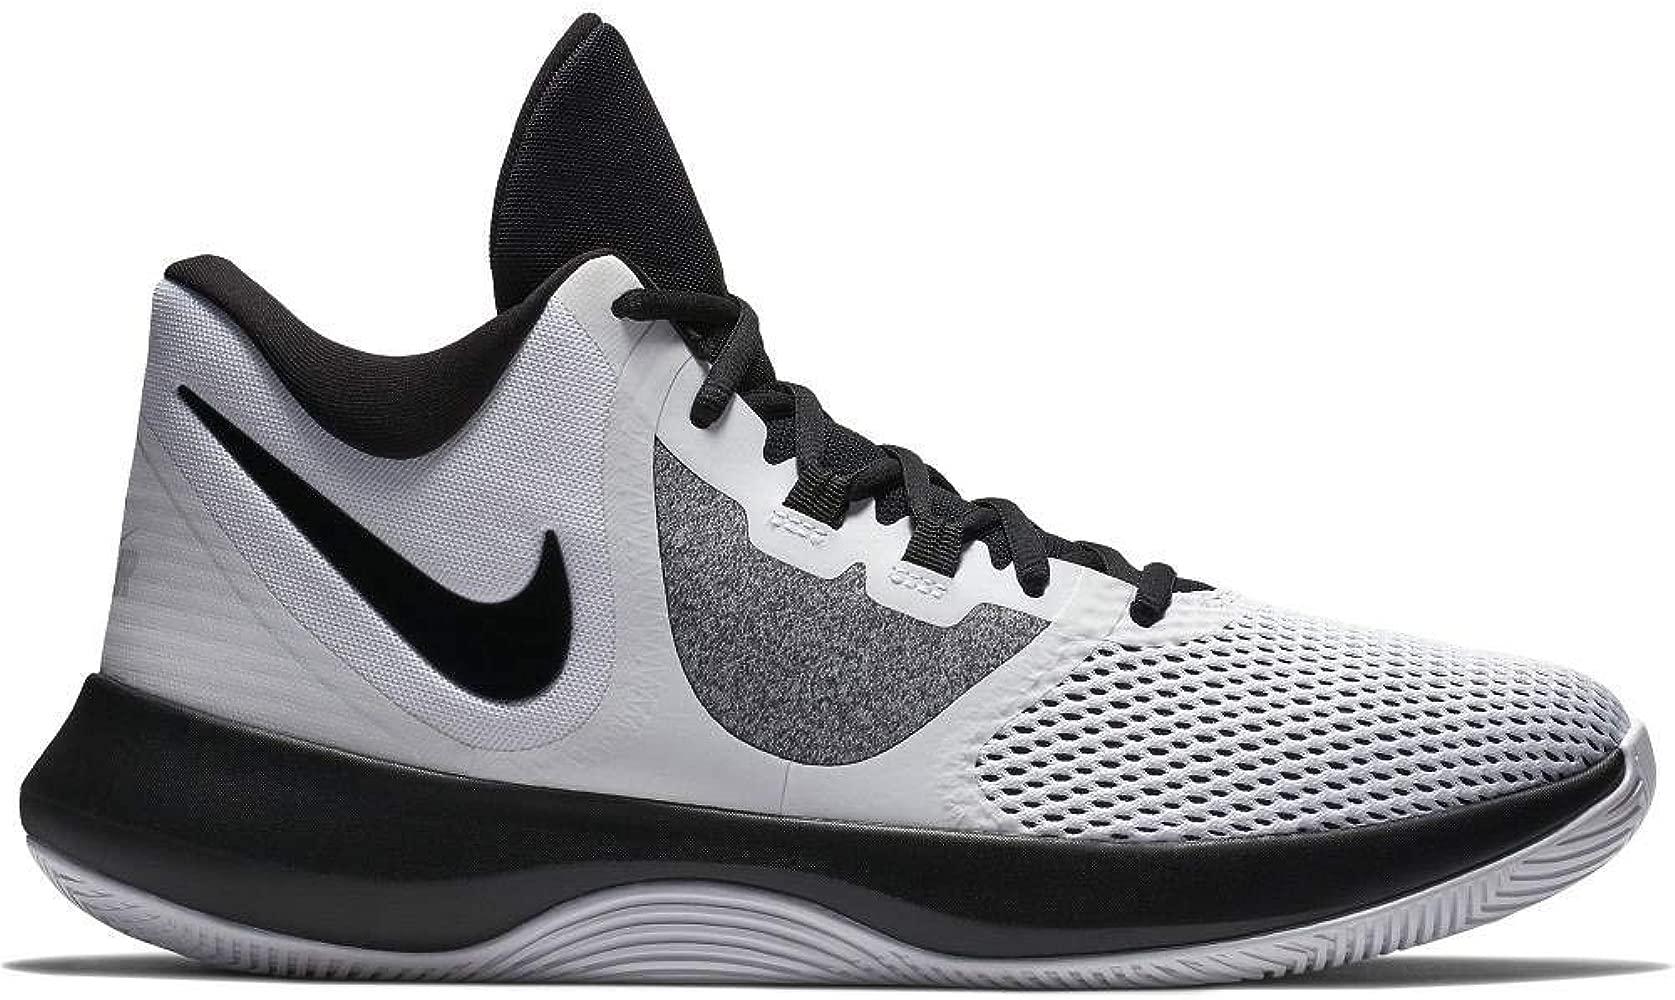 Amazon.com: Nike Air Precision II - Zapatillas de baloncesto ...